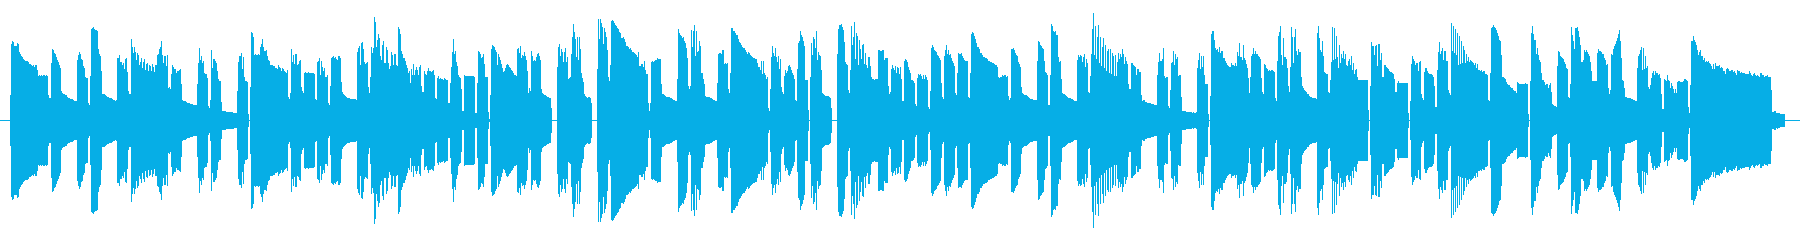 NES STG C01-1(タイトル) の再生済みの波形